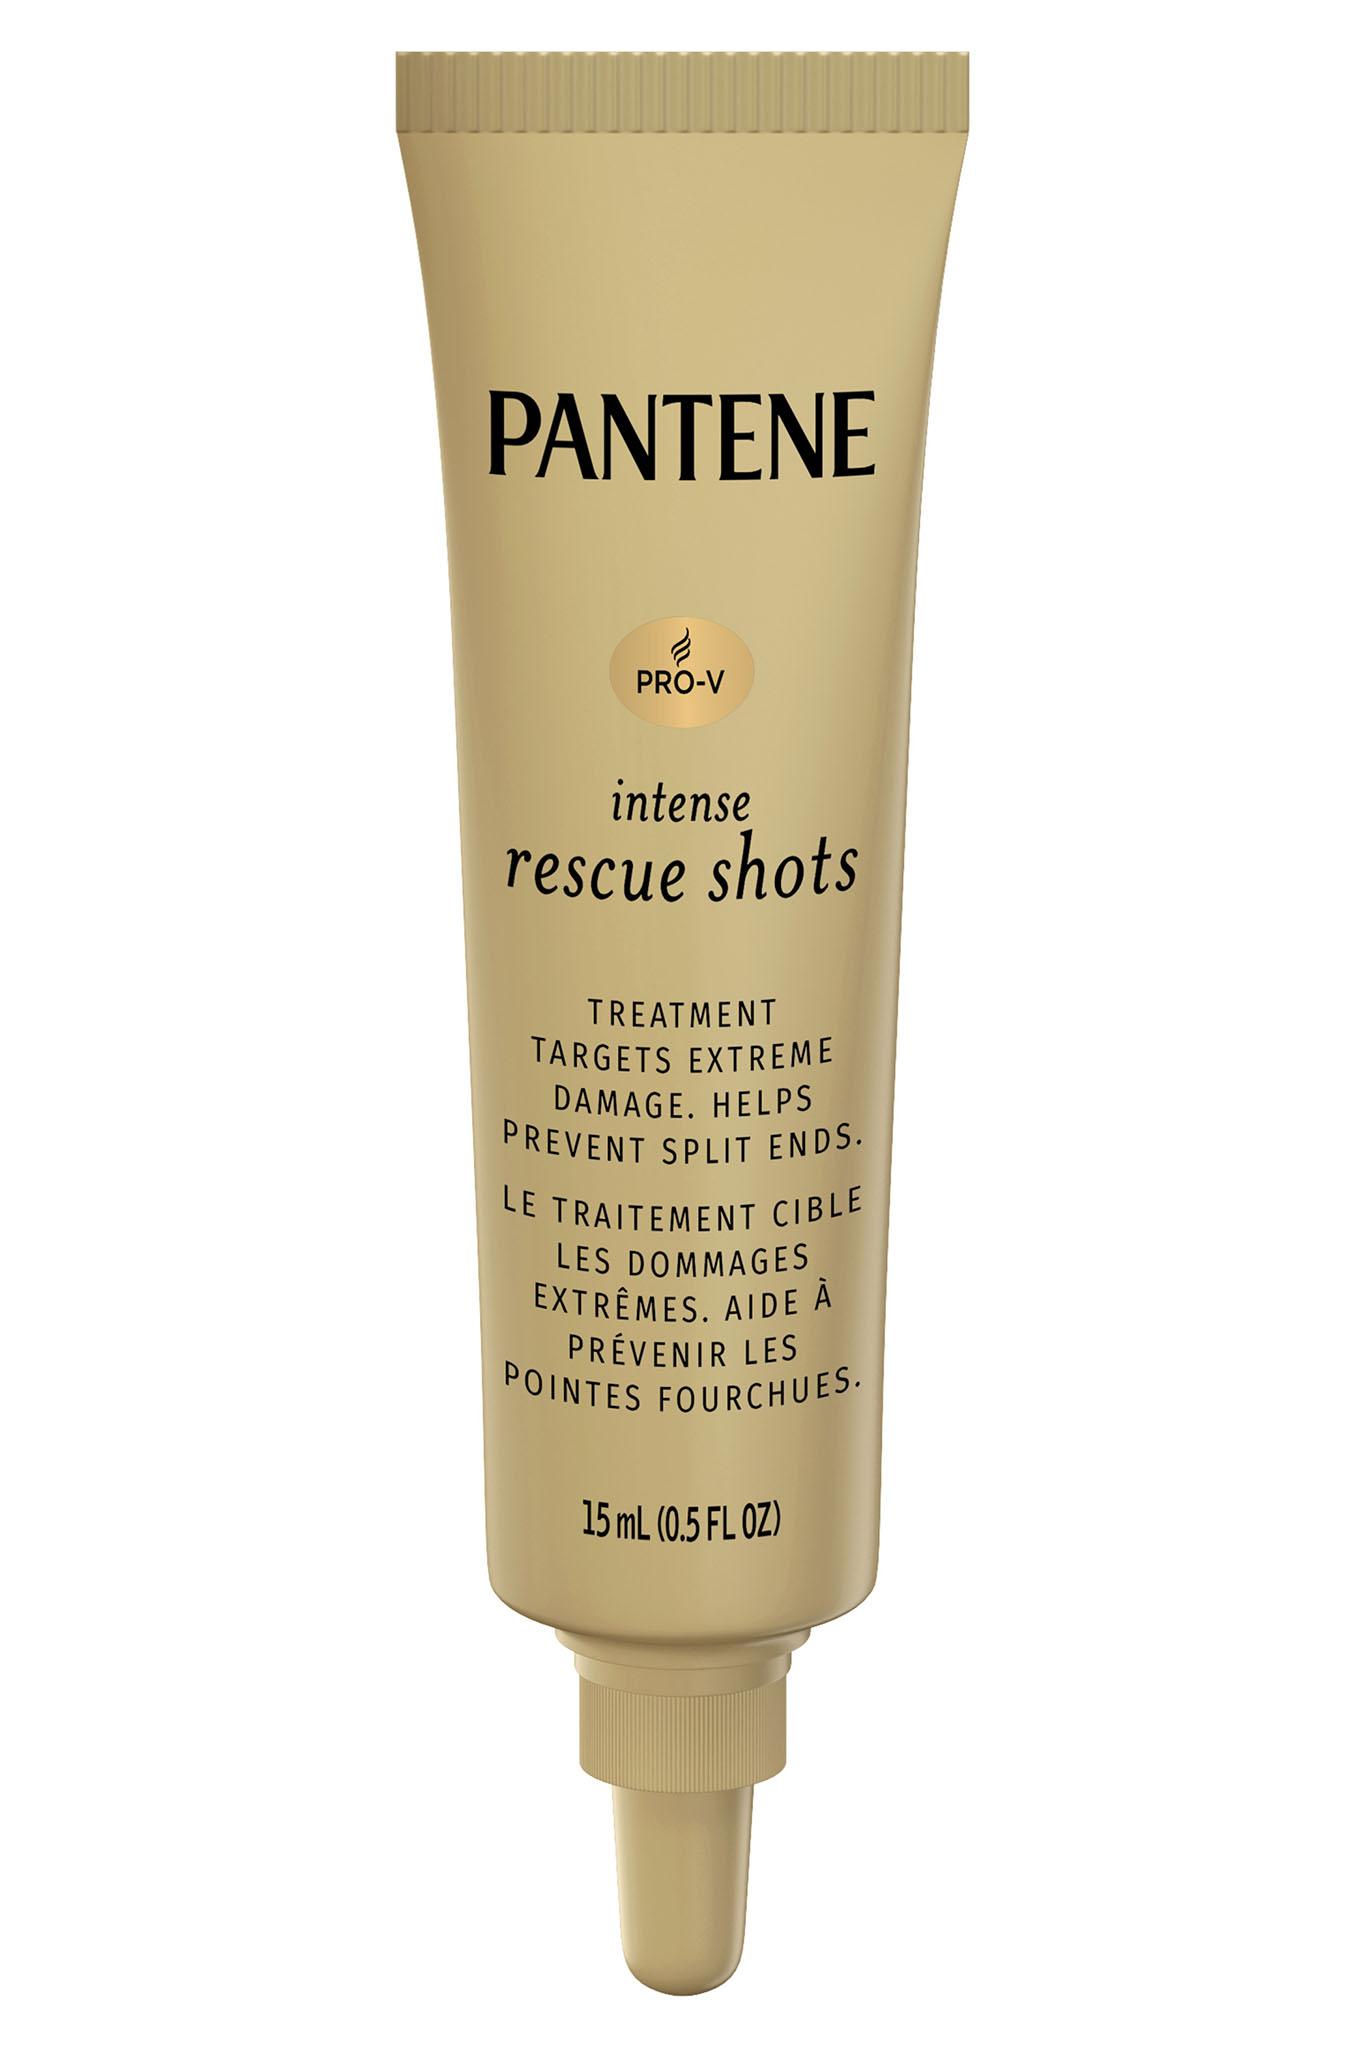 Pantene Pro-V Intense Rescue Shot